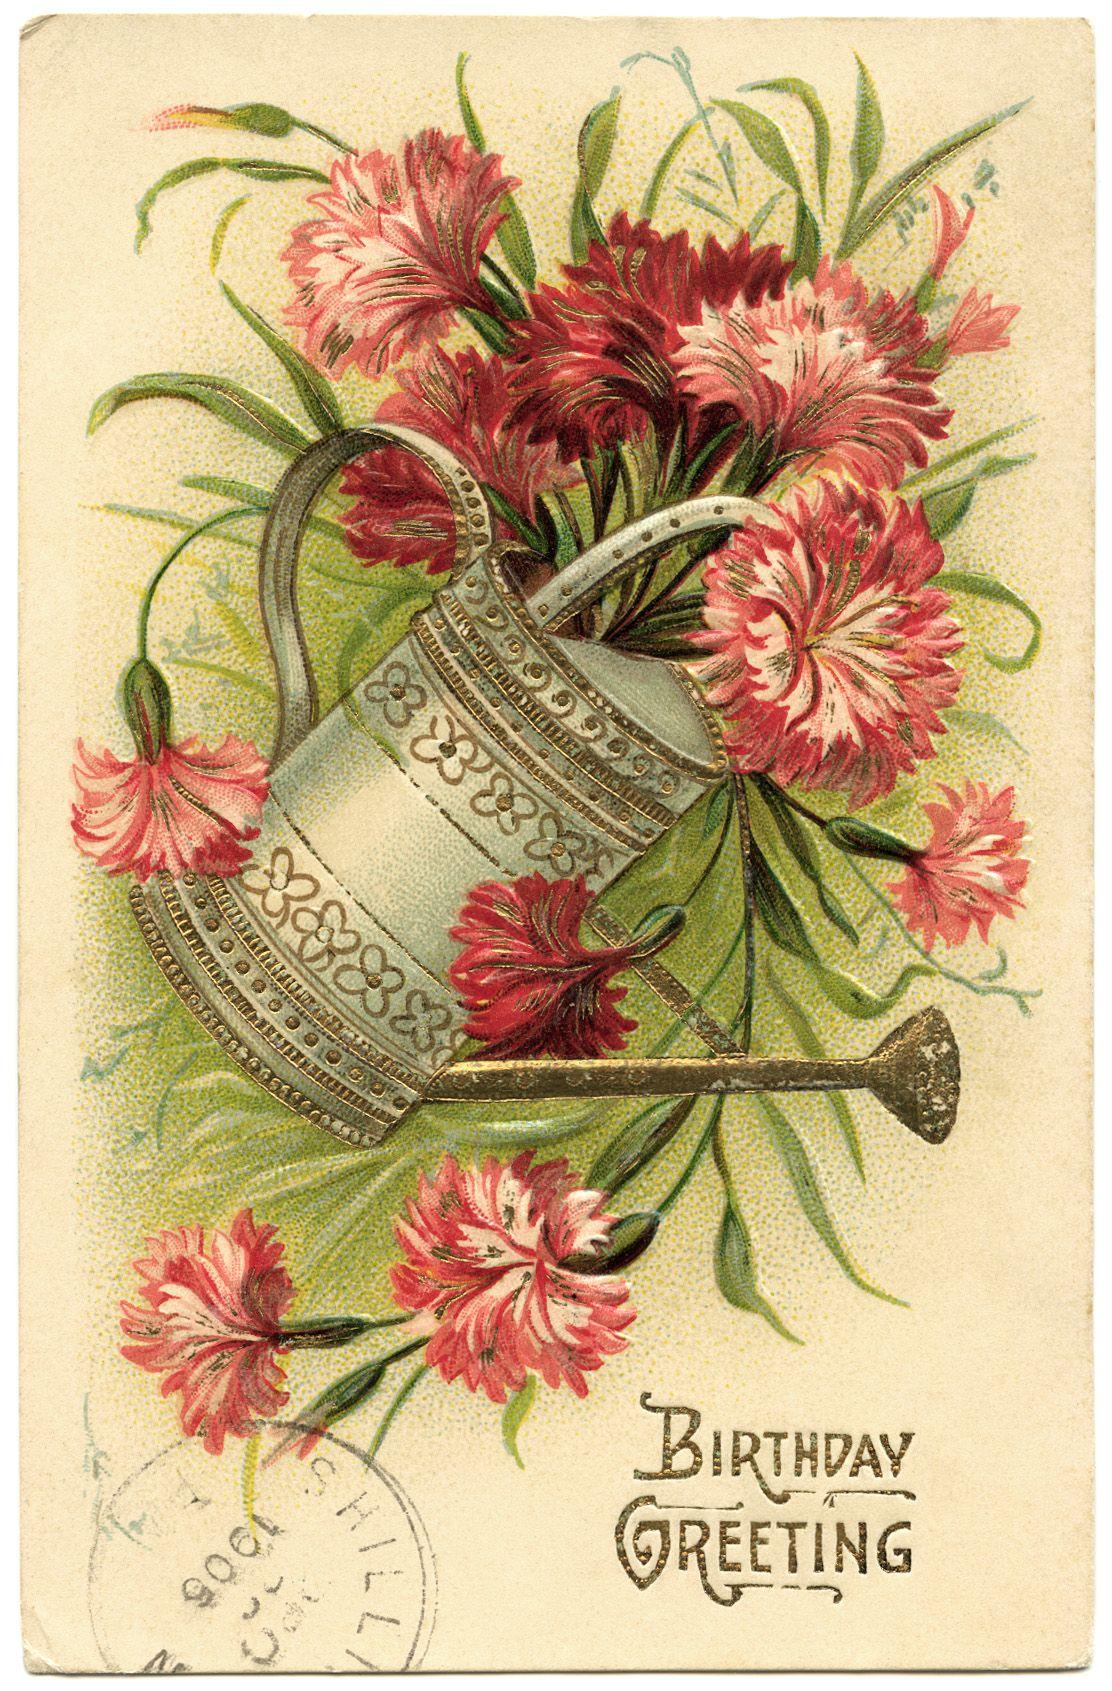 Free Digital Image Vintage Birthday Greeting Postcard Old Design